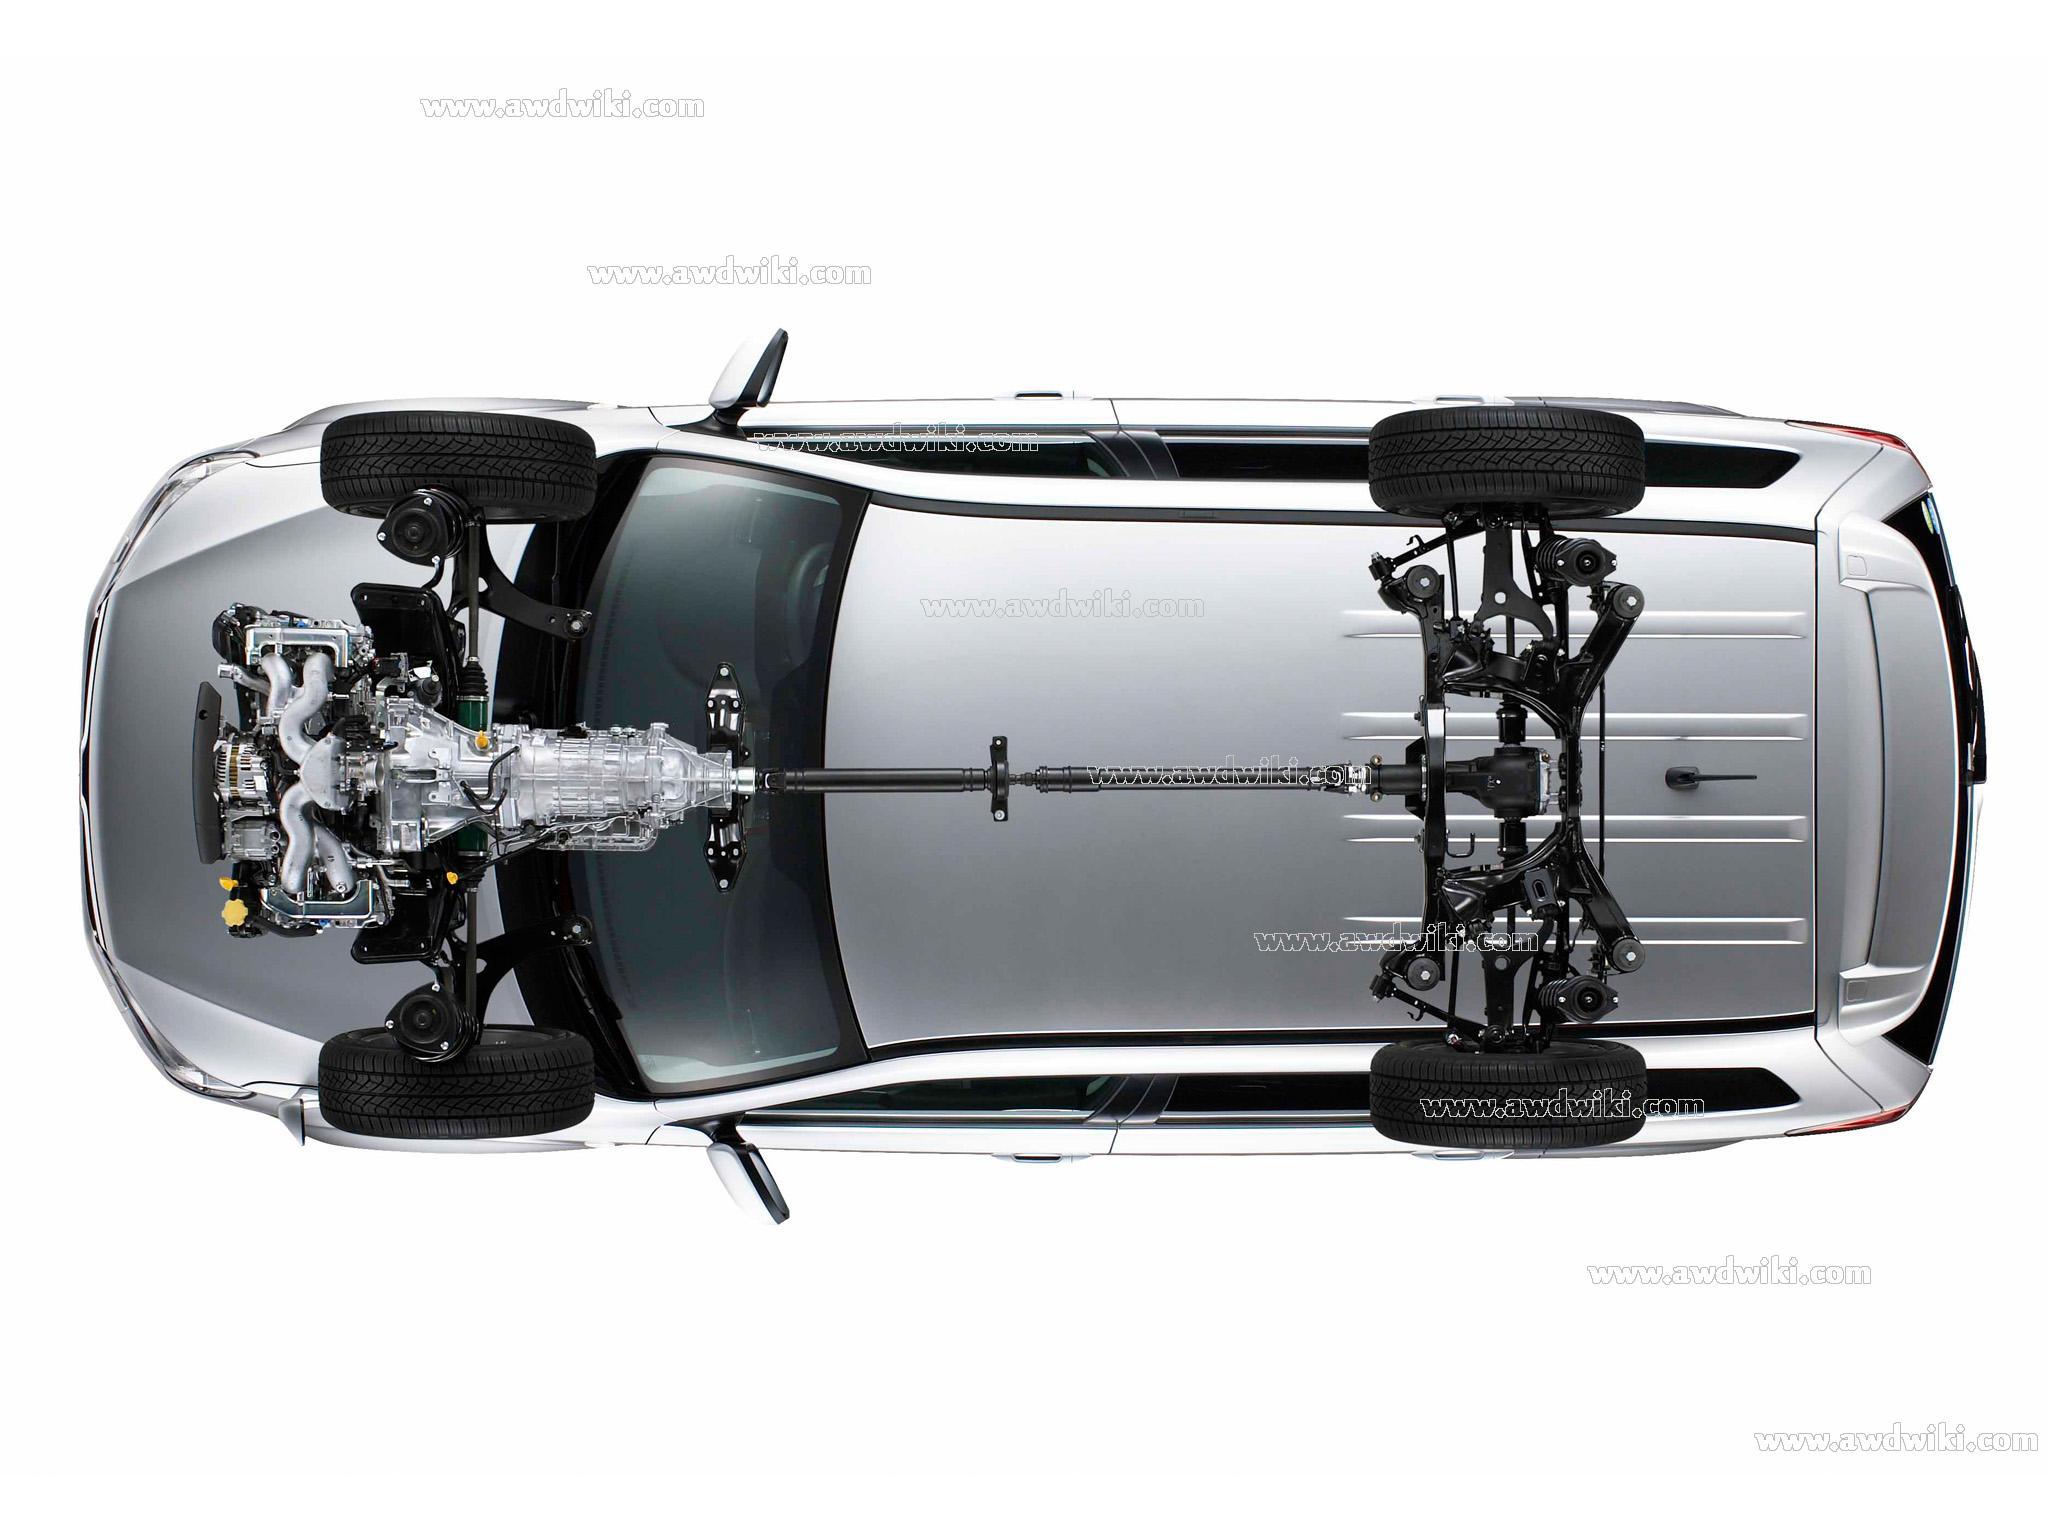 subaru-forester-transsmision-third-generation Surprising Lamborghini Gallardo Hot Wheels Wiki Cars Trend